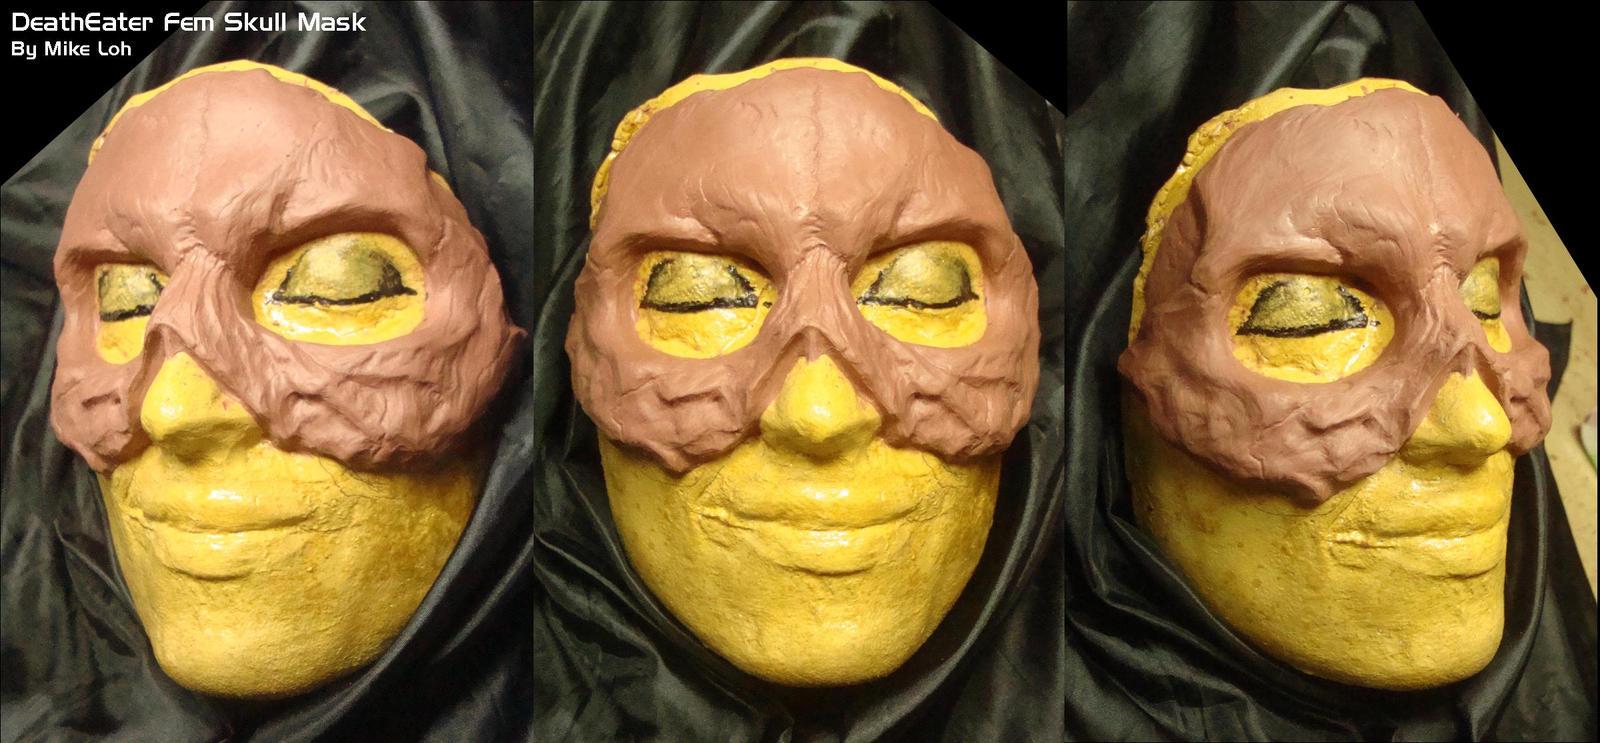 Deatheater fem skull wip1 by uratz studios on deviantart - Uratz studios ...